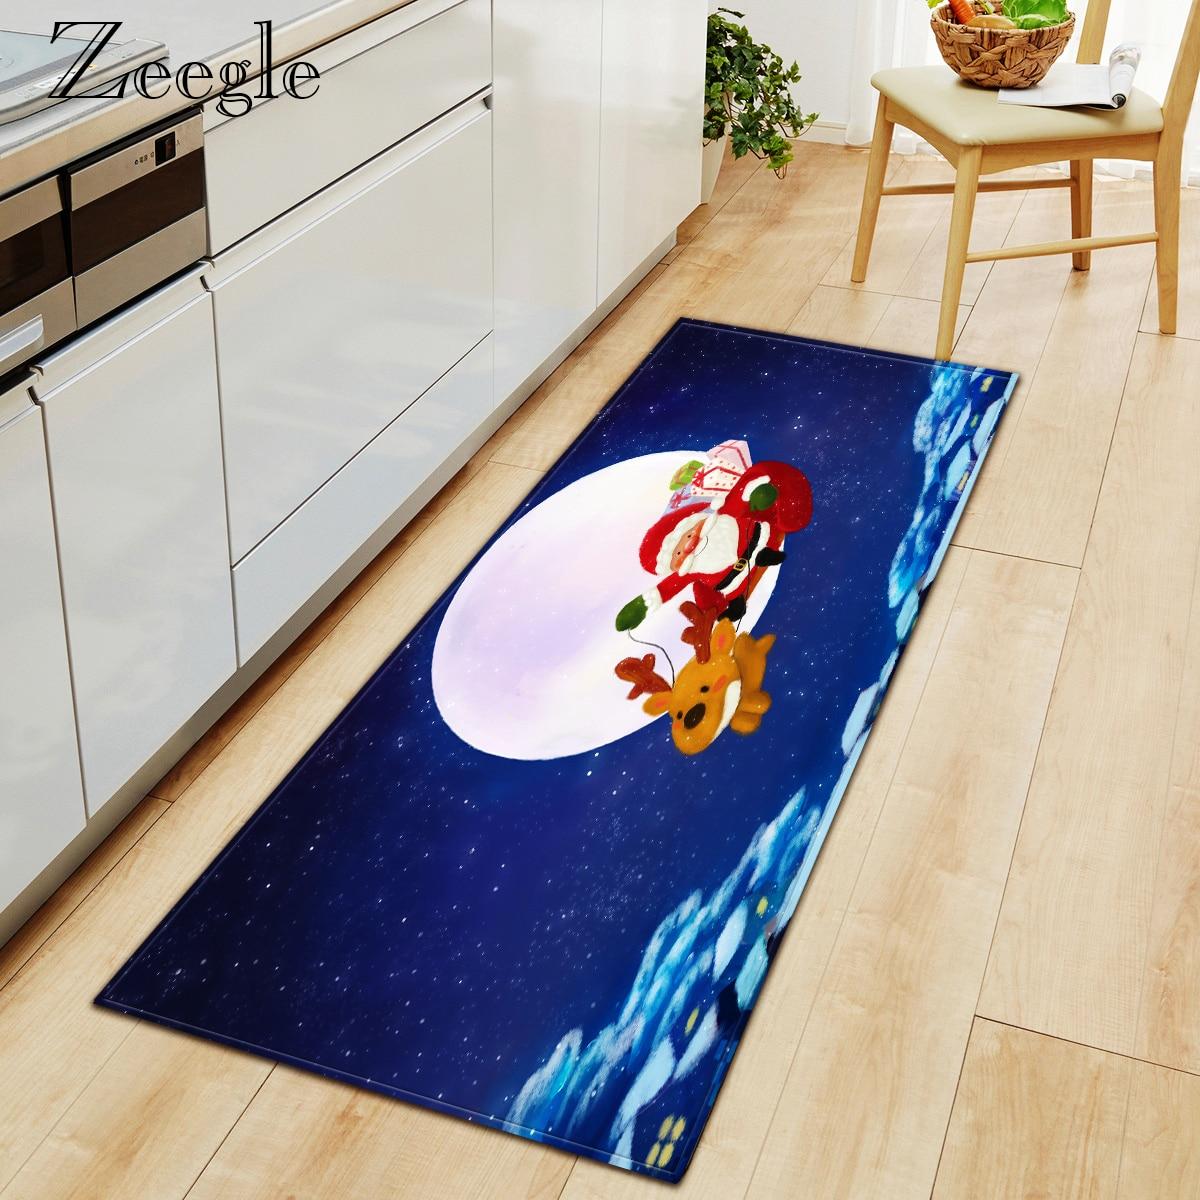 Zeegle Rug Christmas Printed Carpet Anti-slip Water Absorbent Entrance Doormat Bedroom Doormat Hallway Carpet Soft Foot Mat